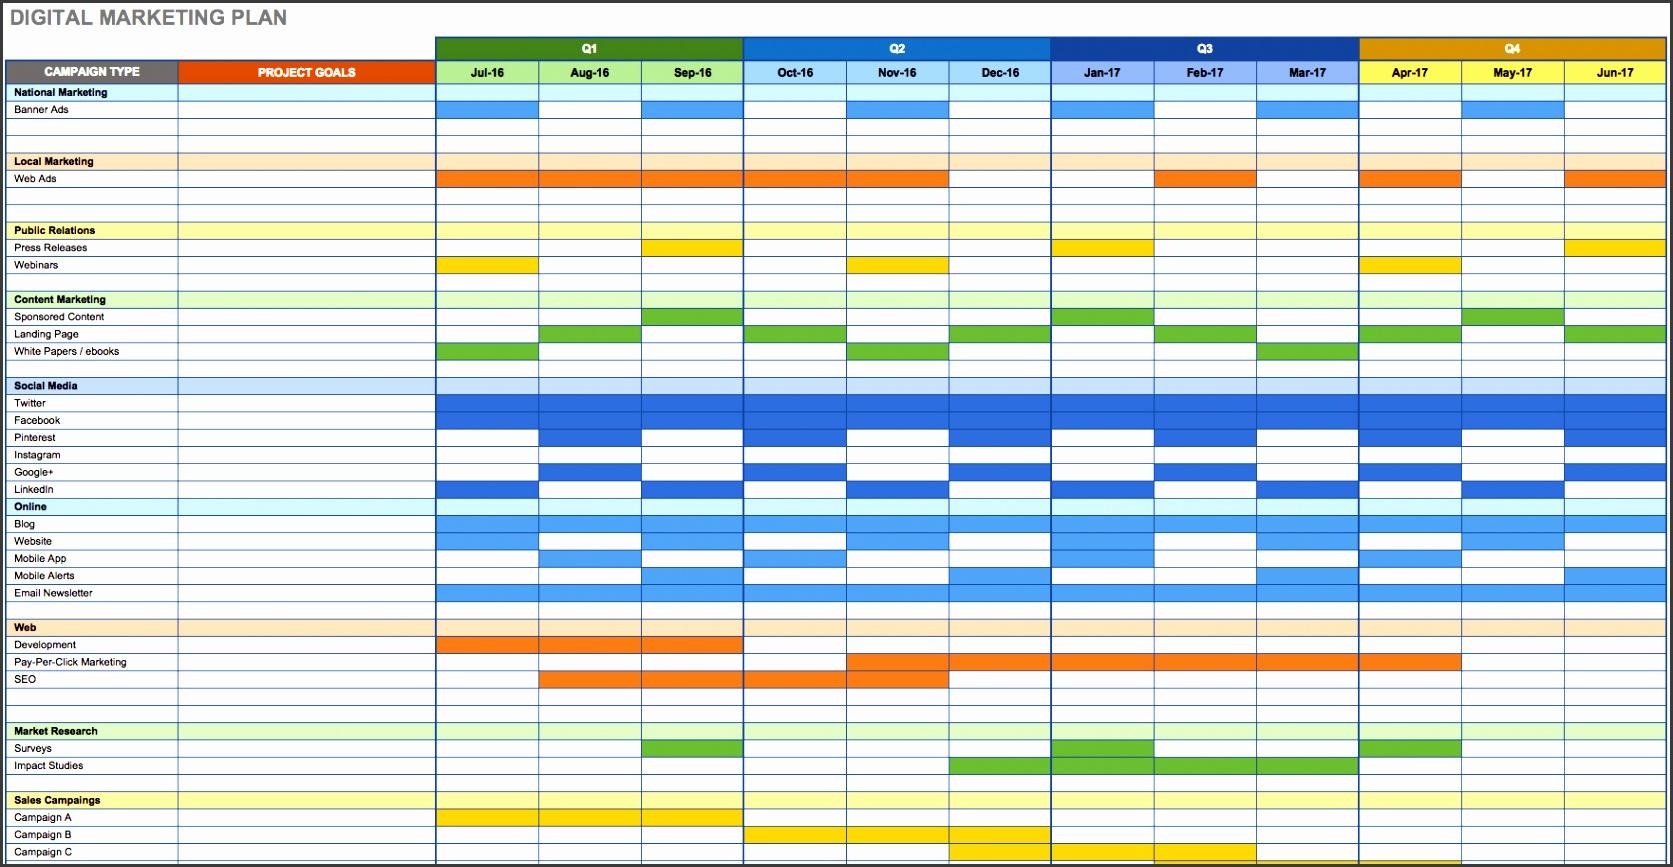 excel marketing okl mindsprout co social media content calendar template digital 2016 free best hubspot editorial 2015 email